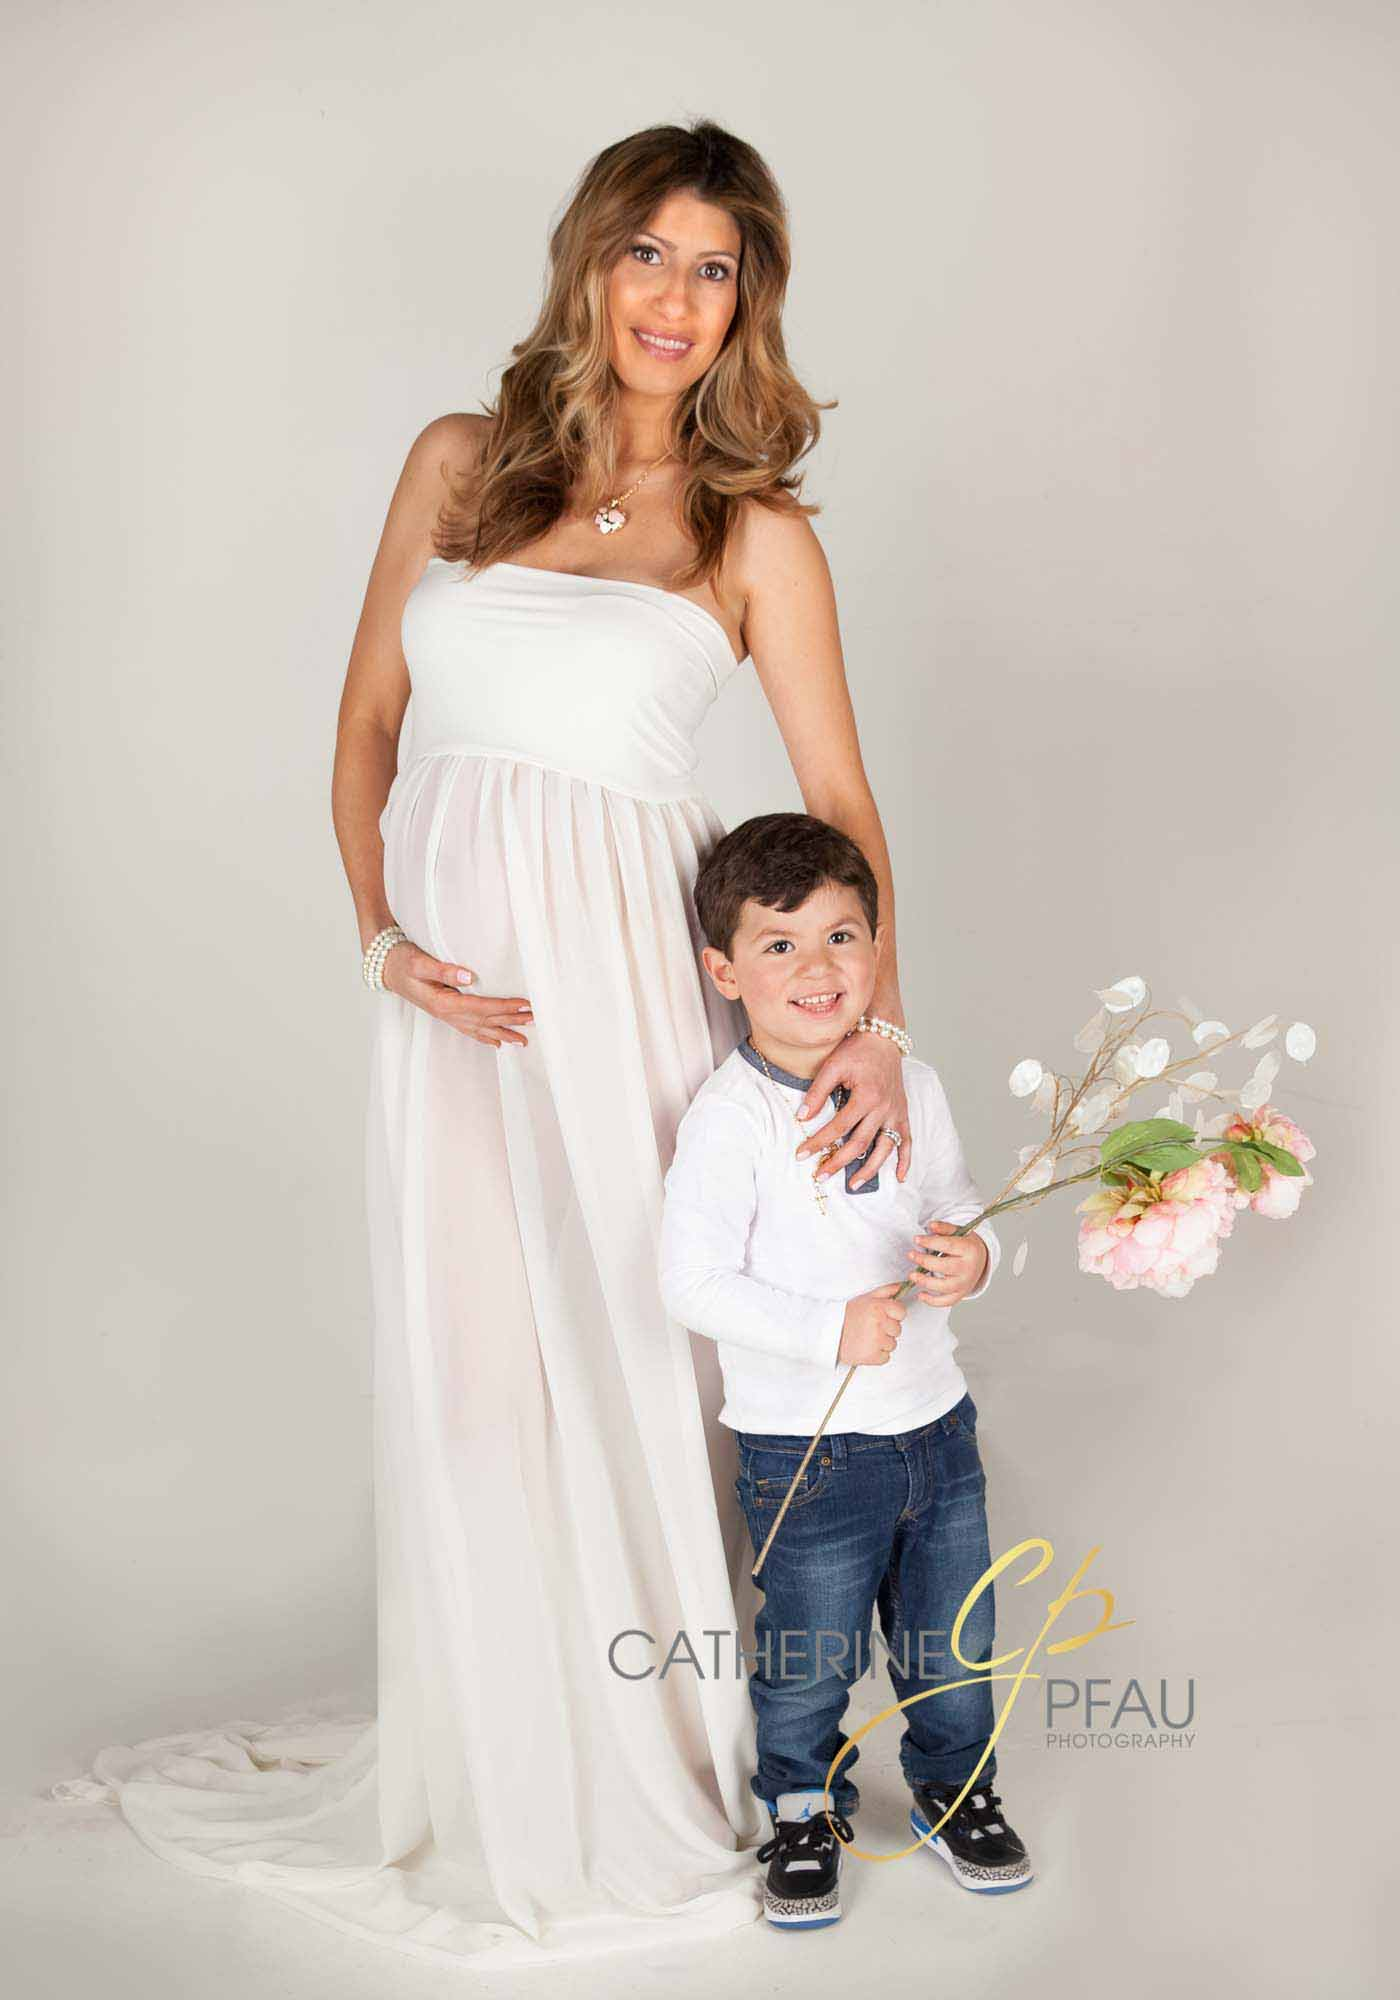 catherinepfauphotography_familyportrait_children_photography-3.jpg